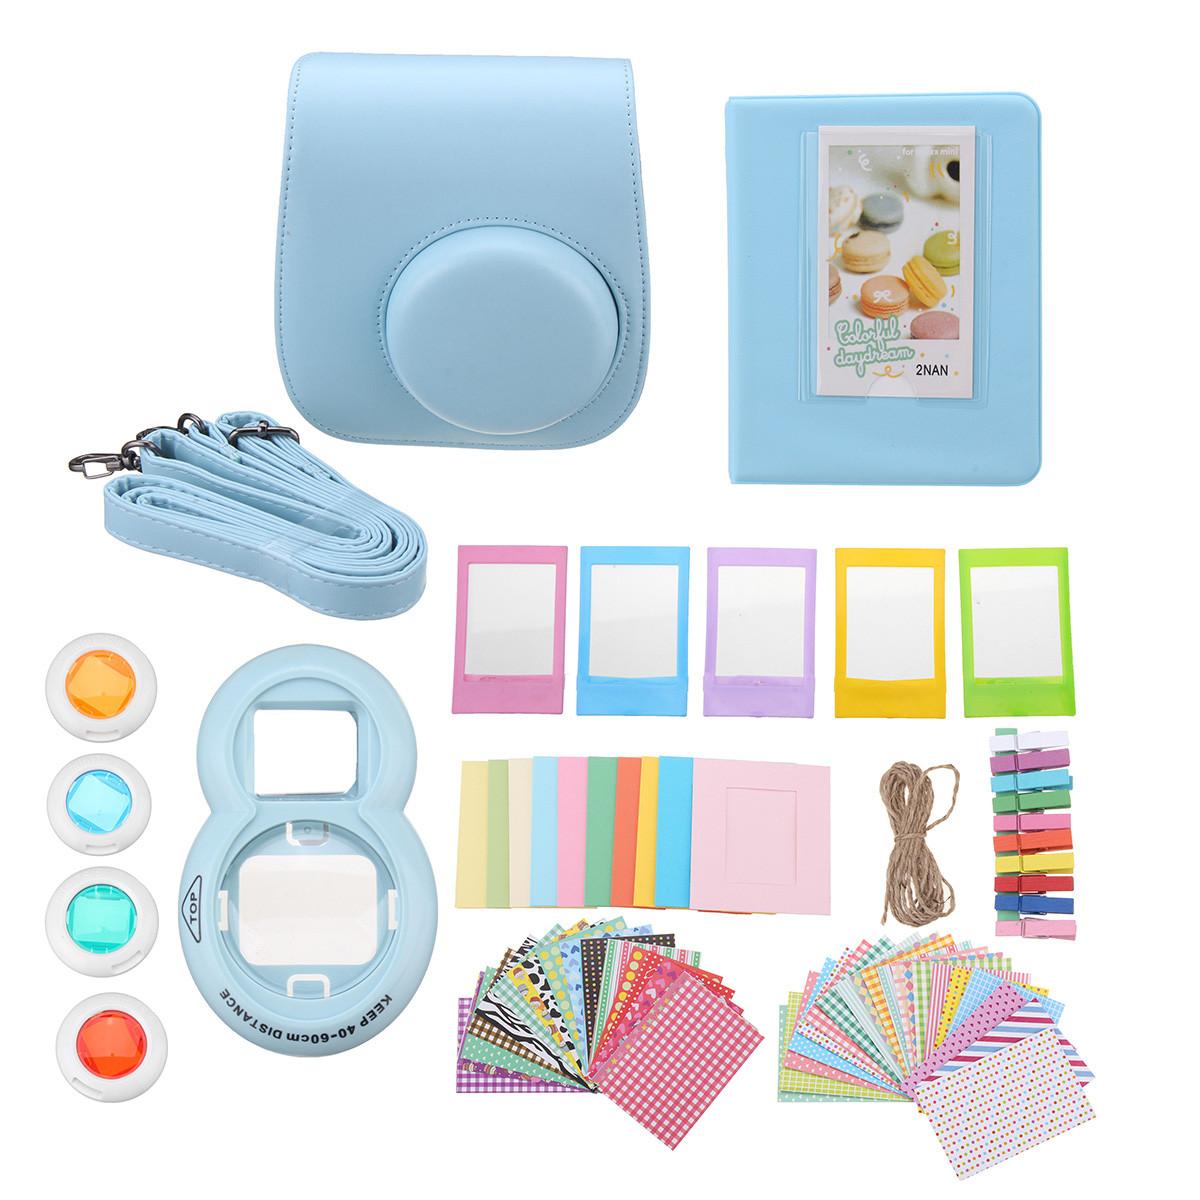 9-In-1-Portable-Film-Camera-Accessory-Bundles-Bag-For-Fujifilm-Instax-min7-8-9